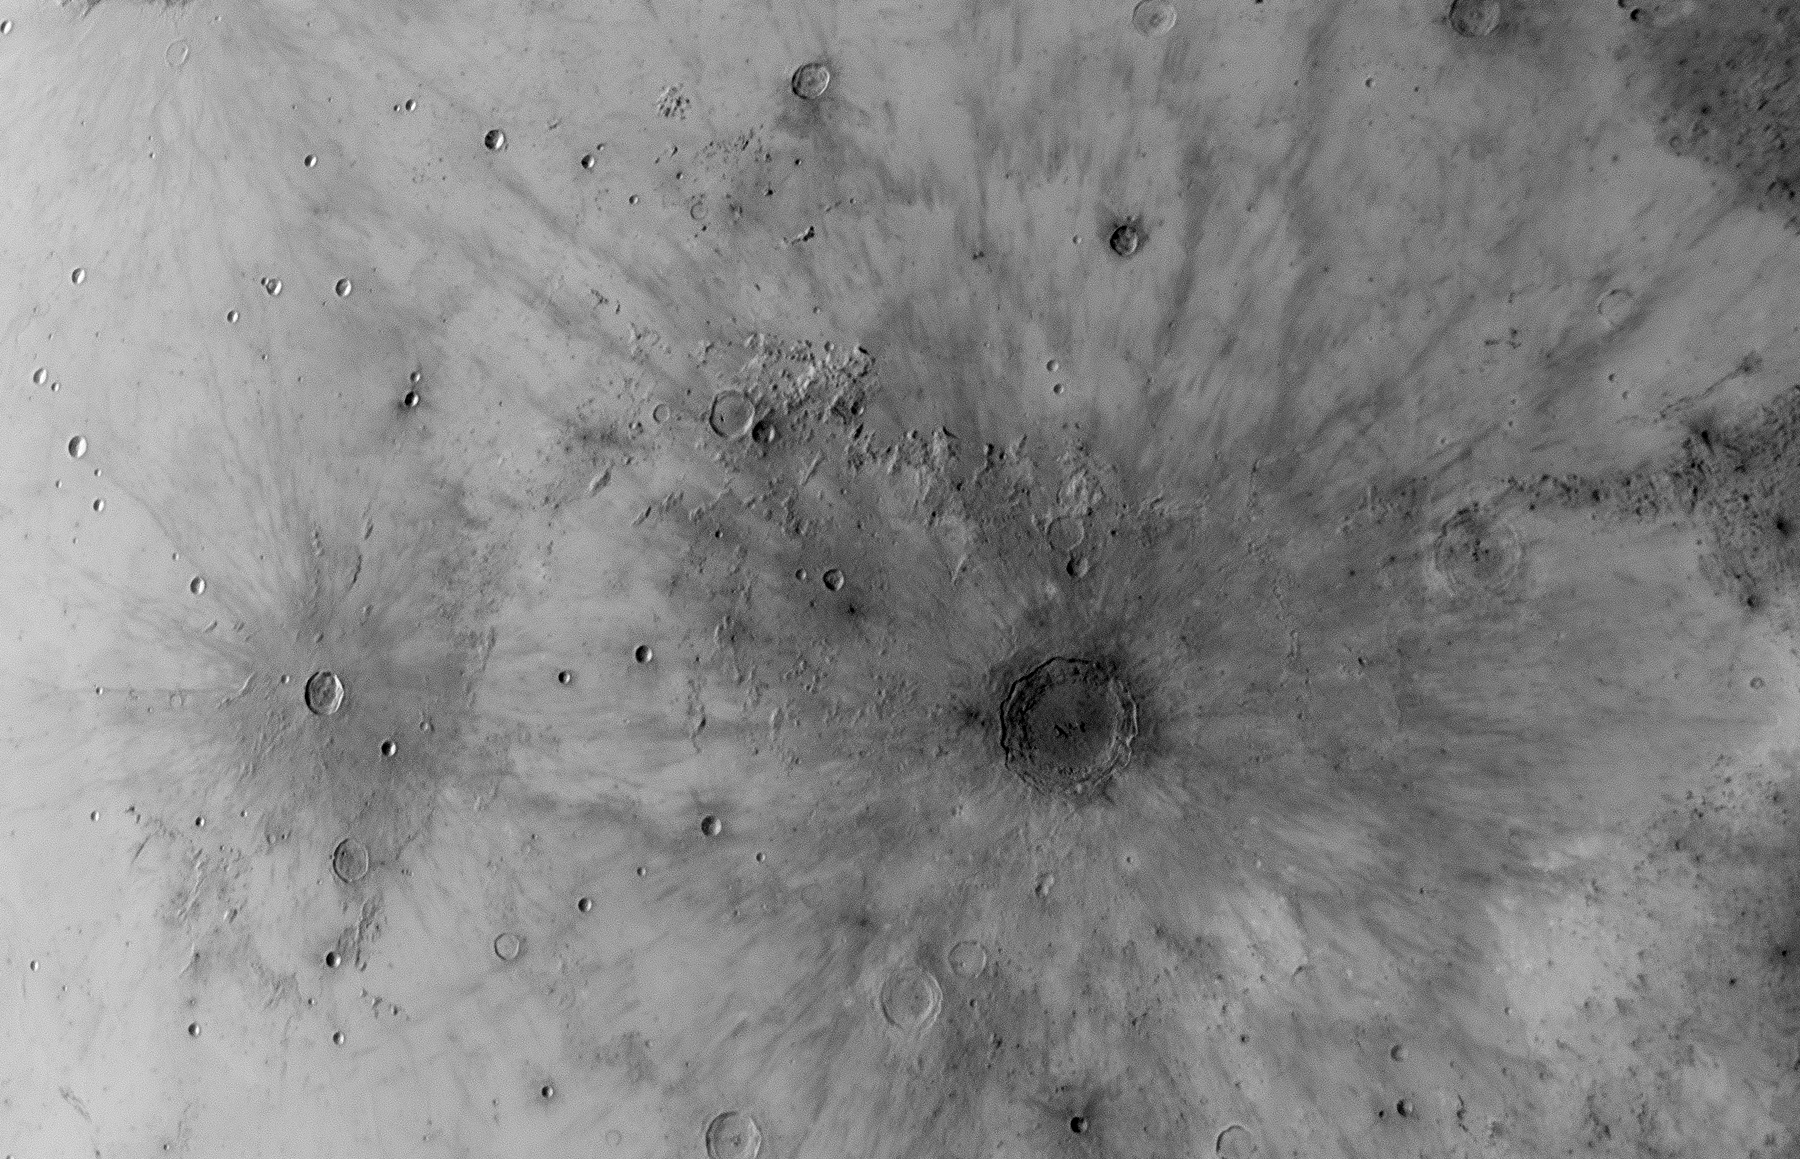 Kepler & Copernicus inverted rays